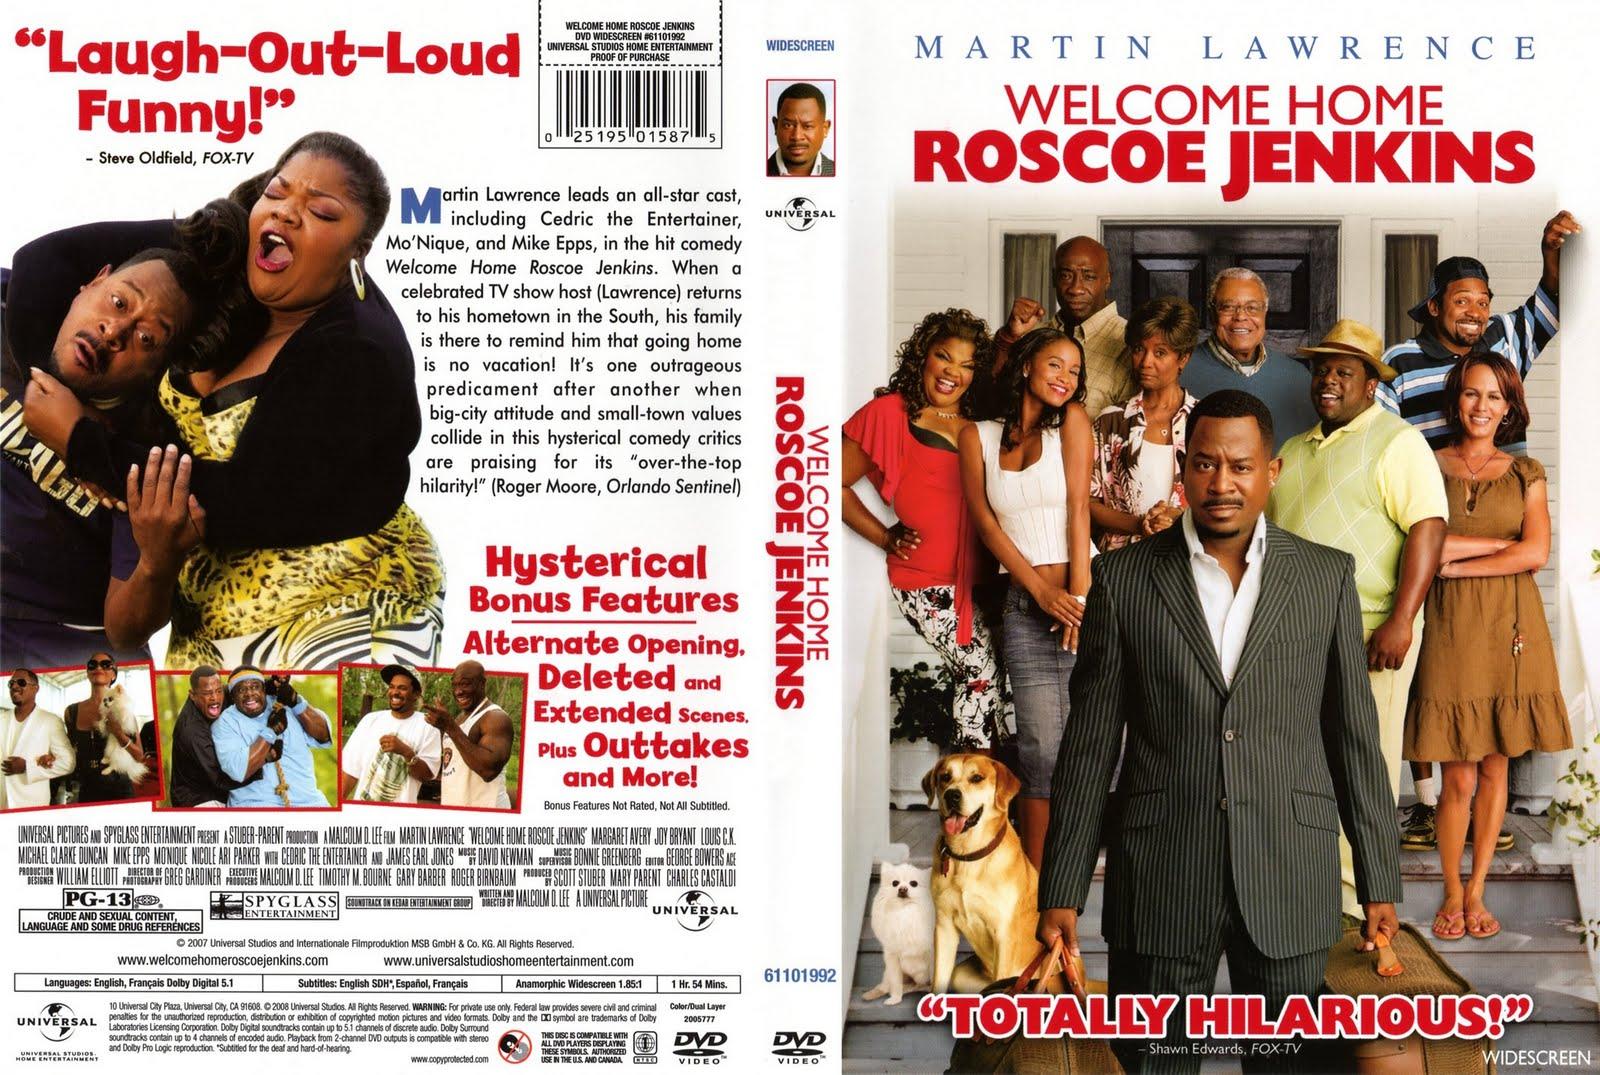 http://2.bp.blogspot.com/_8uKyCux5hbo/TIeXdoWqnMI/AAAAAAAAA64/pUvrerIlY3w/s1600/Welcome_Home_Roscoe_Jenkins.jpg